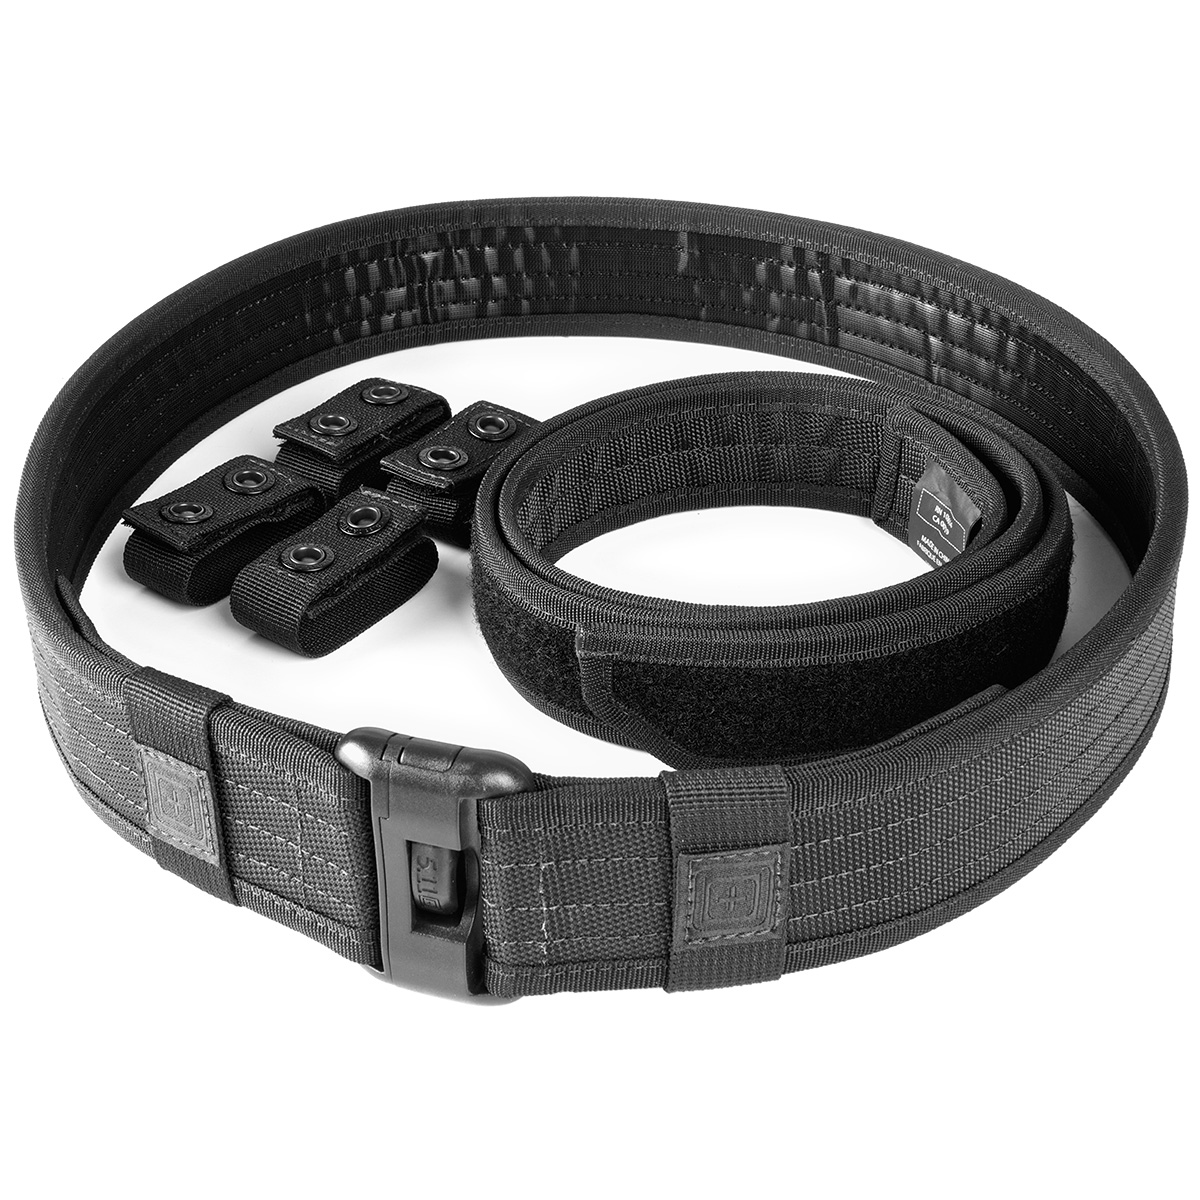 5.11 Tactical Sierra Bravo Police Duty Army Security Nylon Molle Belt Kit Black